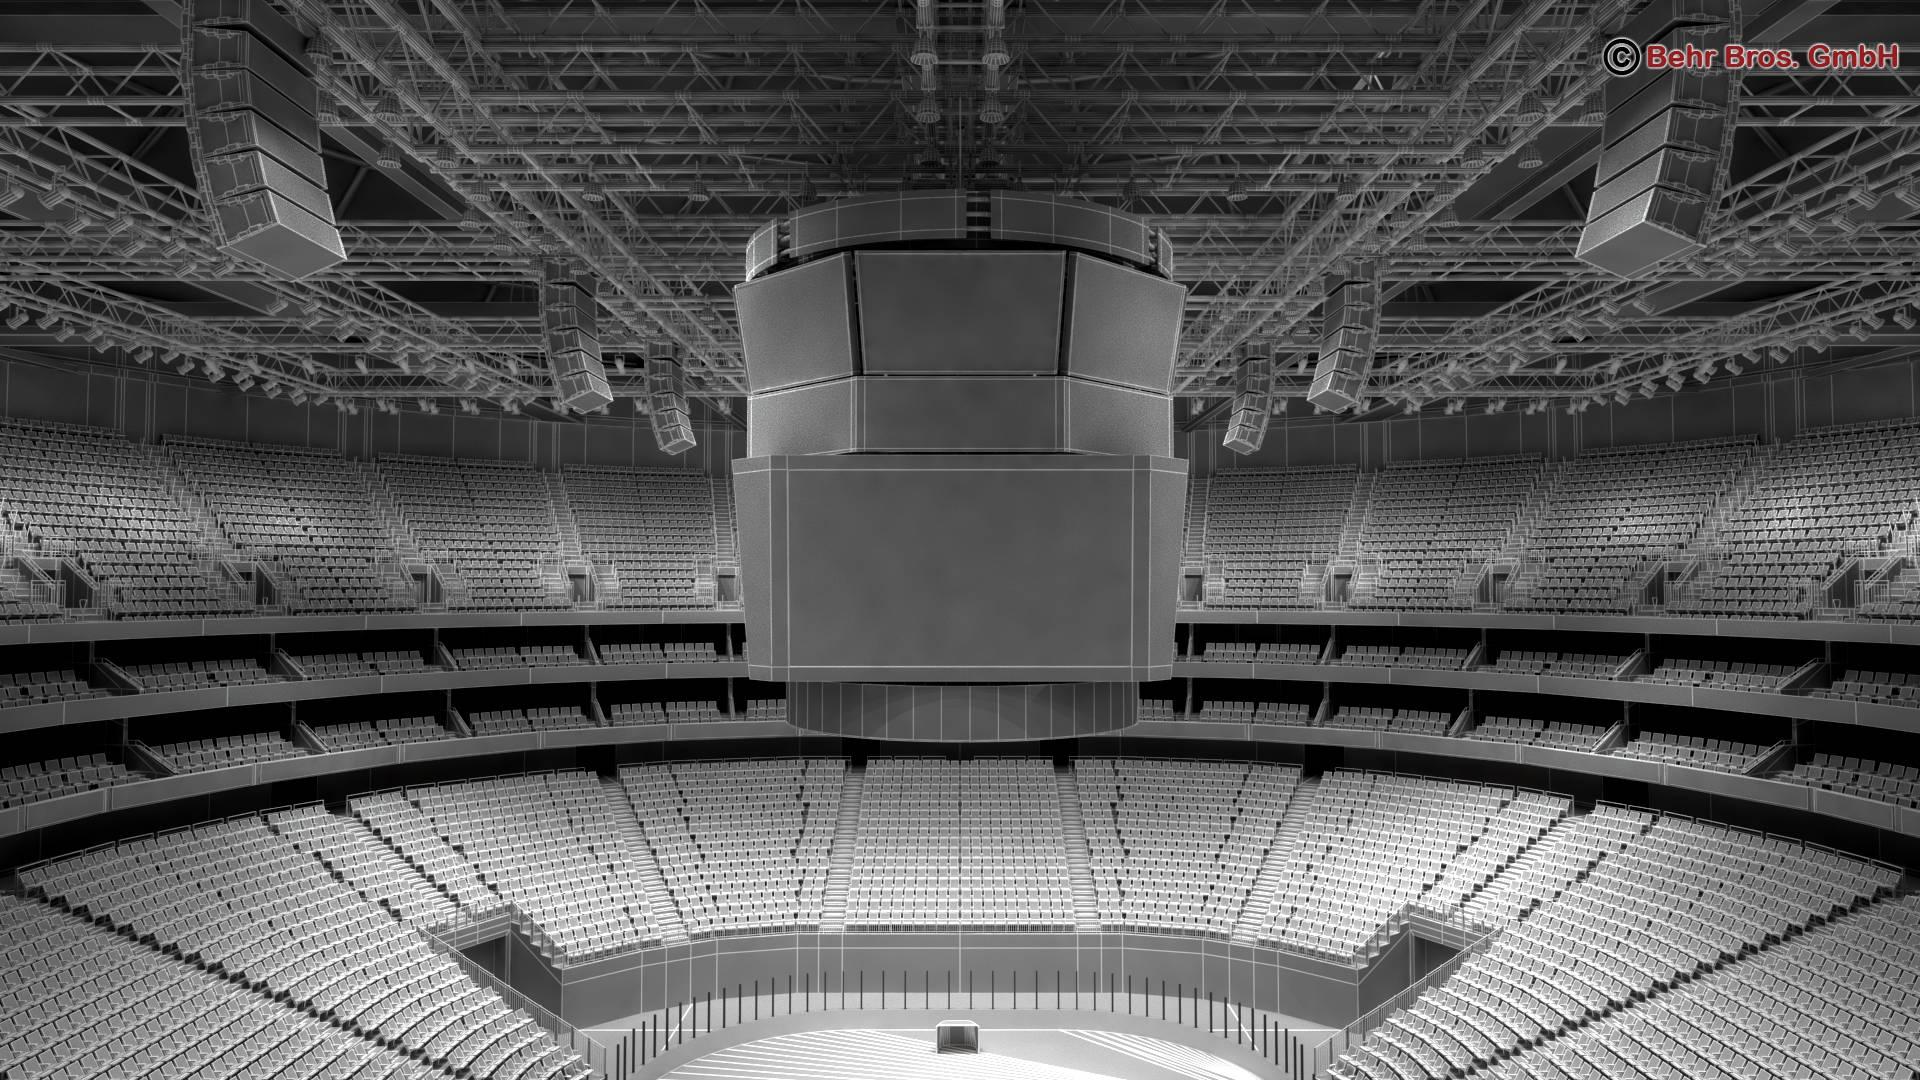 мөсөн хоккейн талбай V2 3d загвар 3ds max fbx c4d 251663